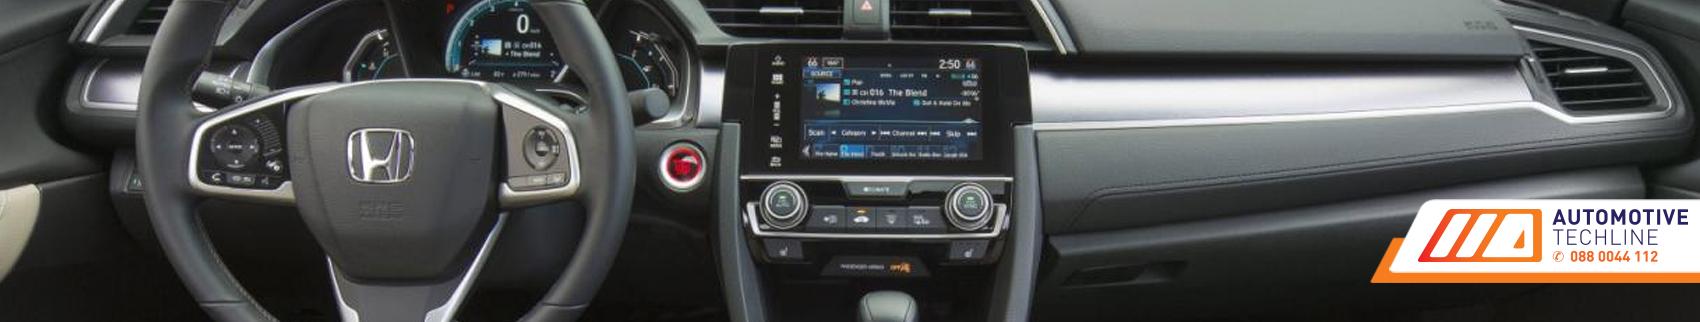 Honda Civic 4dr Hybrid Rijdt Maar Accu En Motor Storingslampje